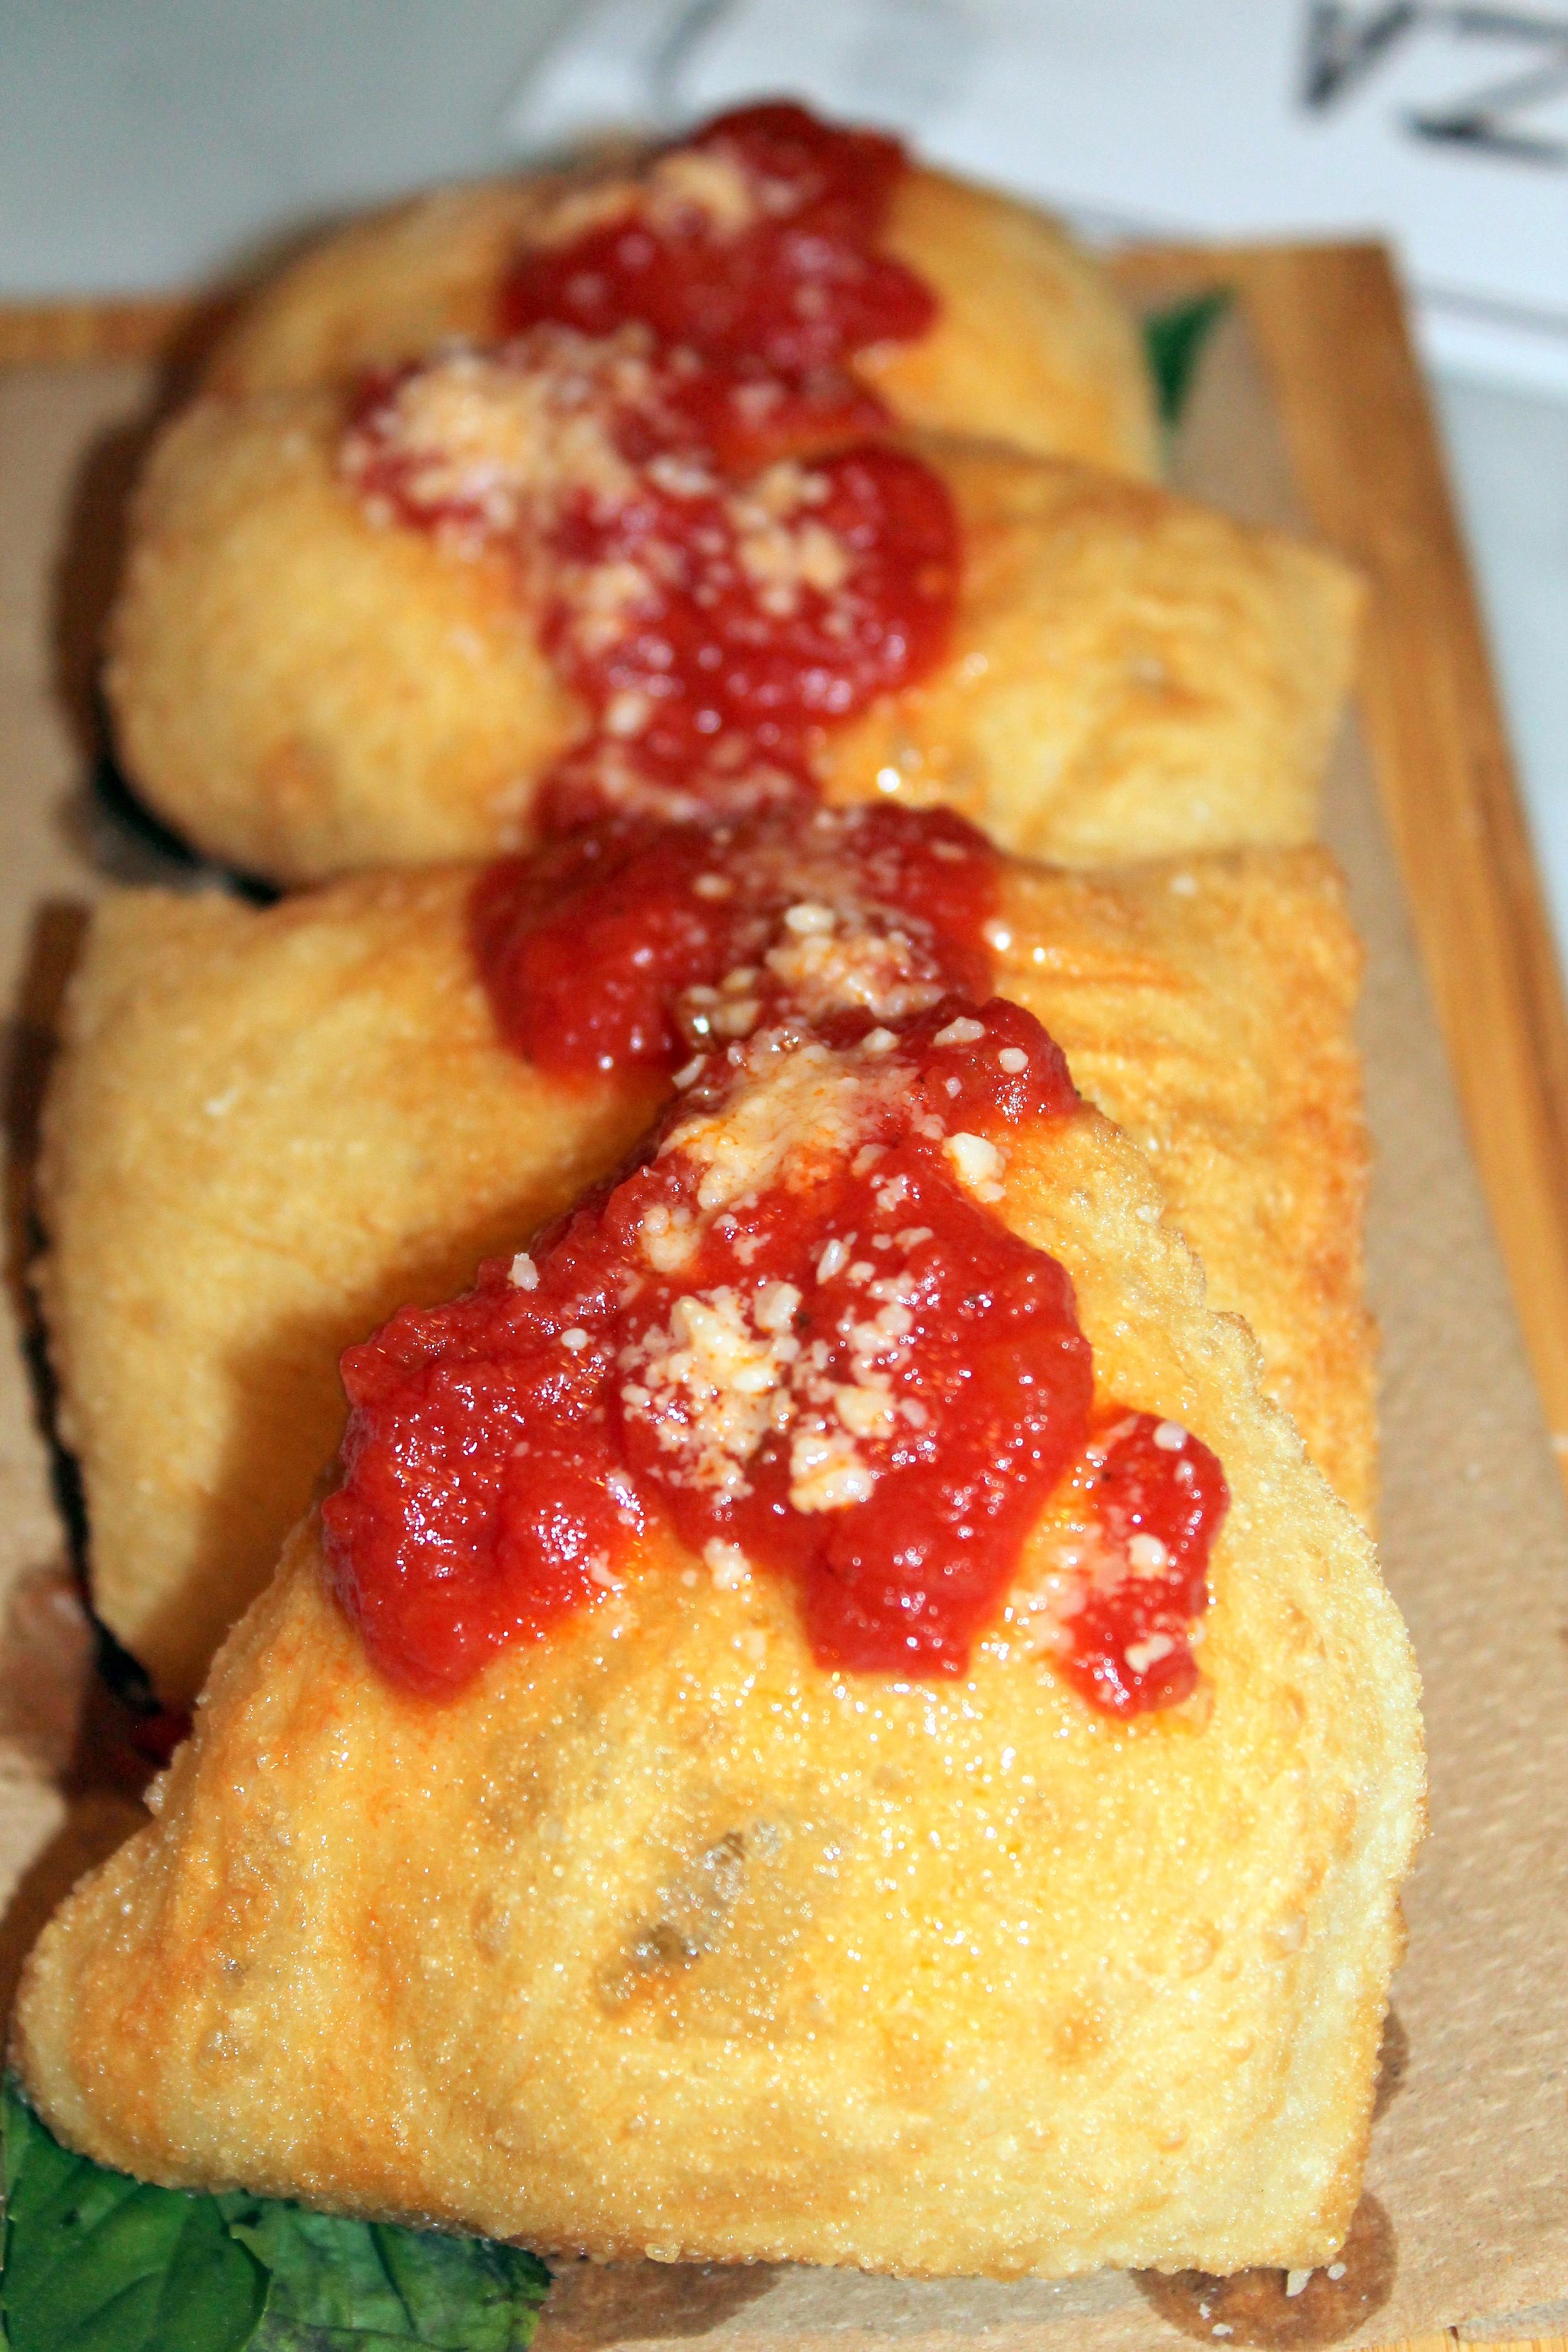 Brick + WOOD, Fairfield CT - Fried pizza dough   Image Jessica Gordon Ryan